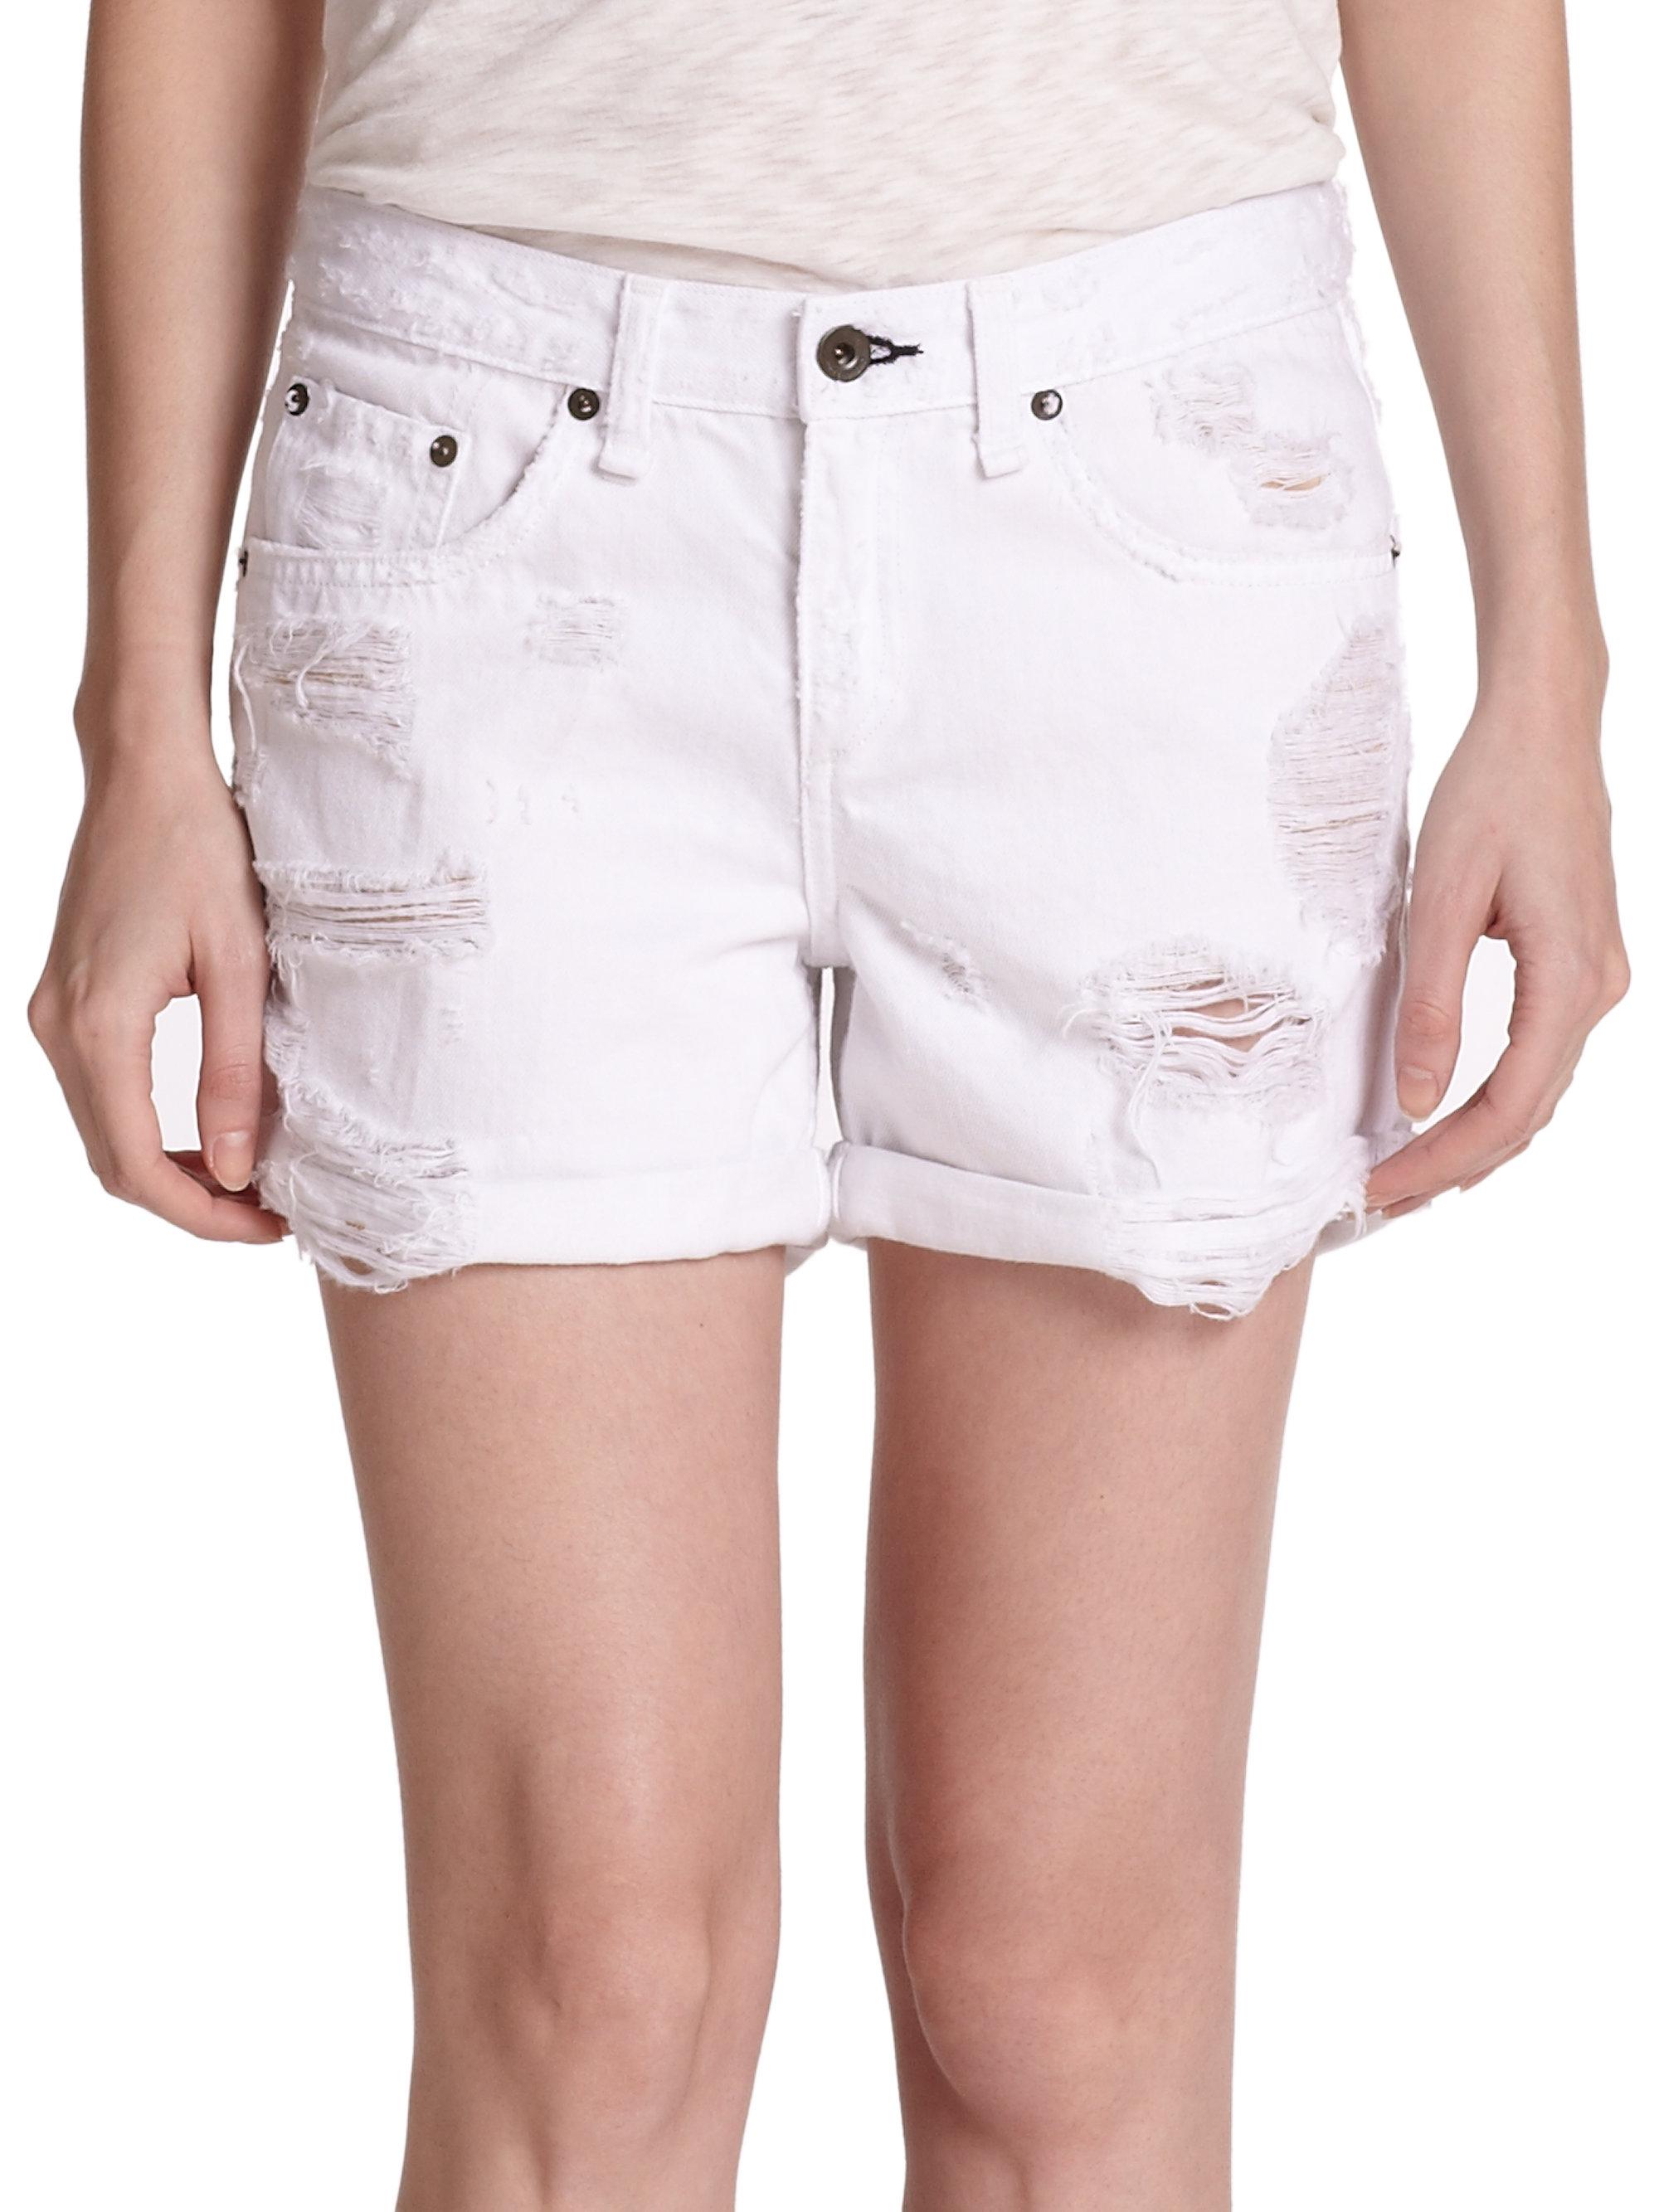 Rag & bone Distressed Boyfriend Shorts in White | Lyst